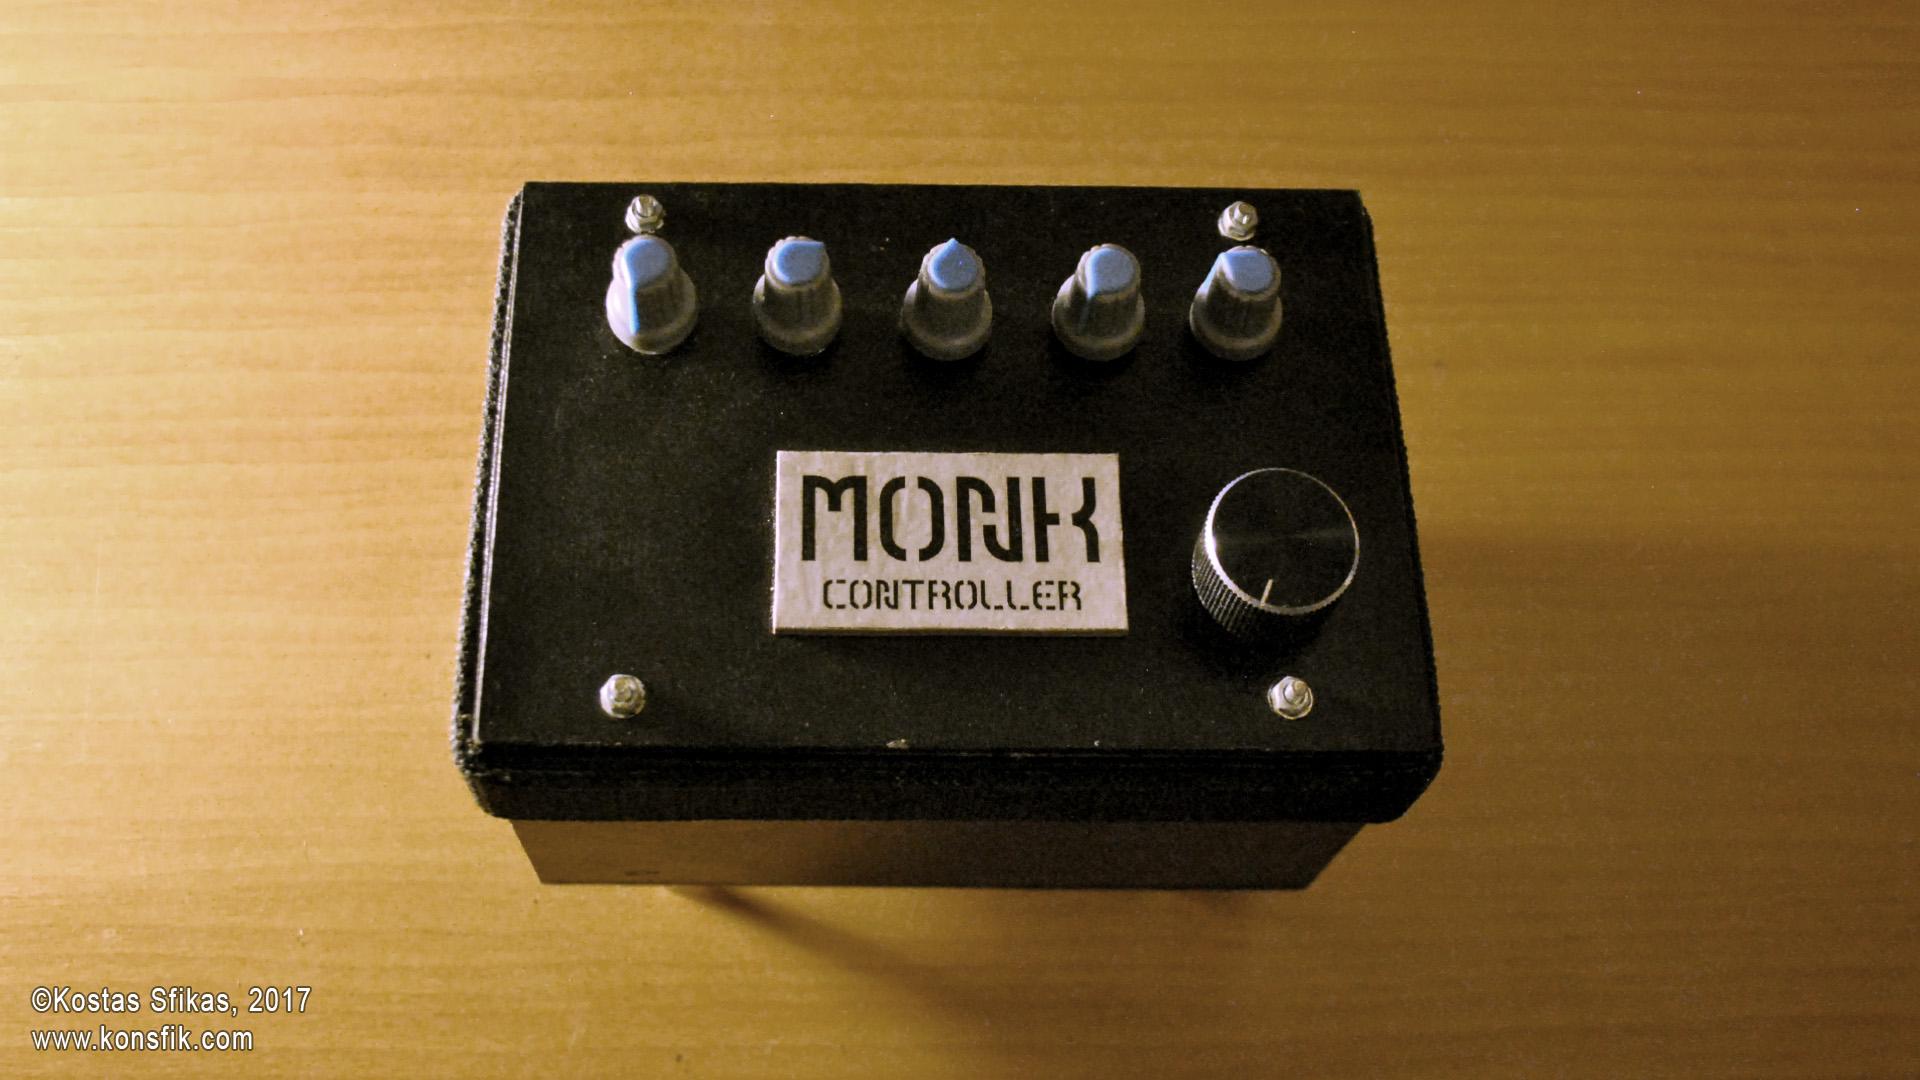 konsfik-monk-programmable-digital-synthesizer-photo-1